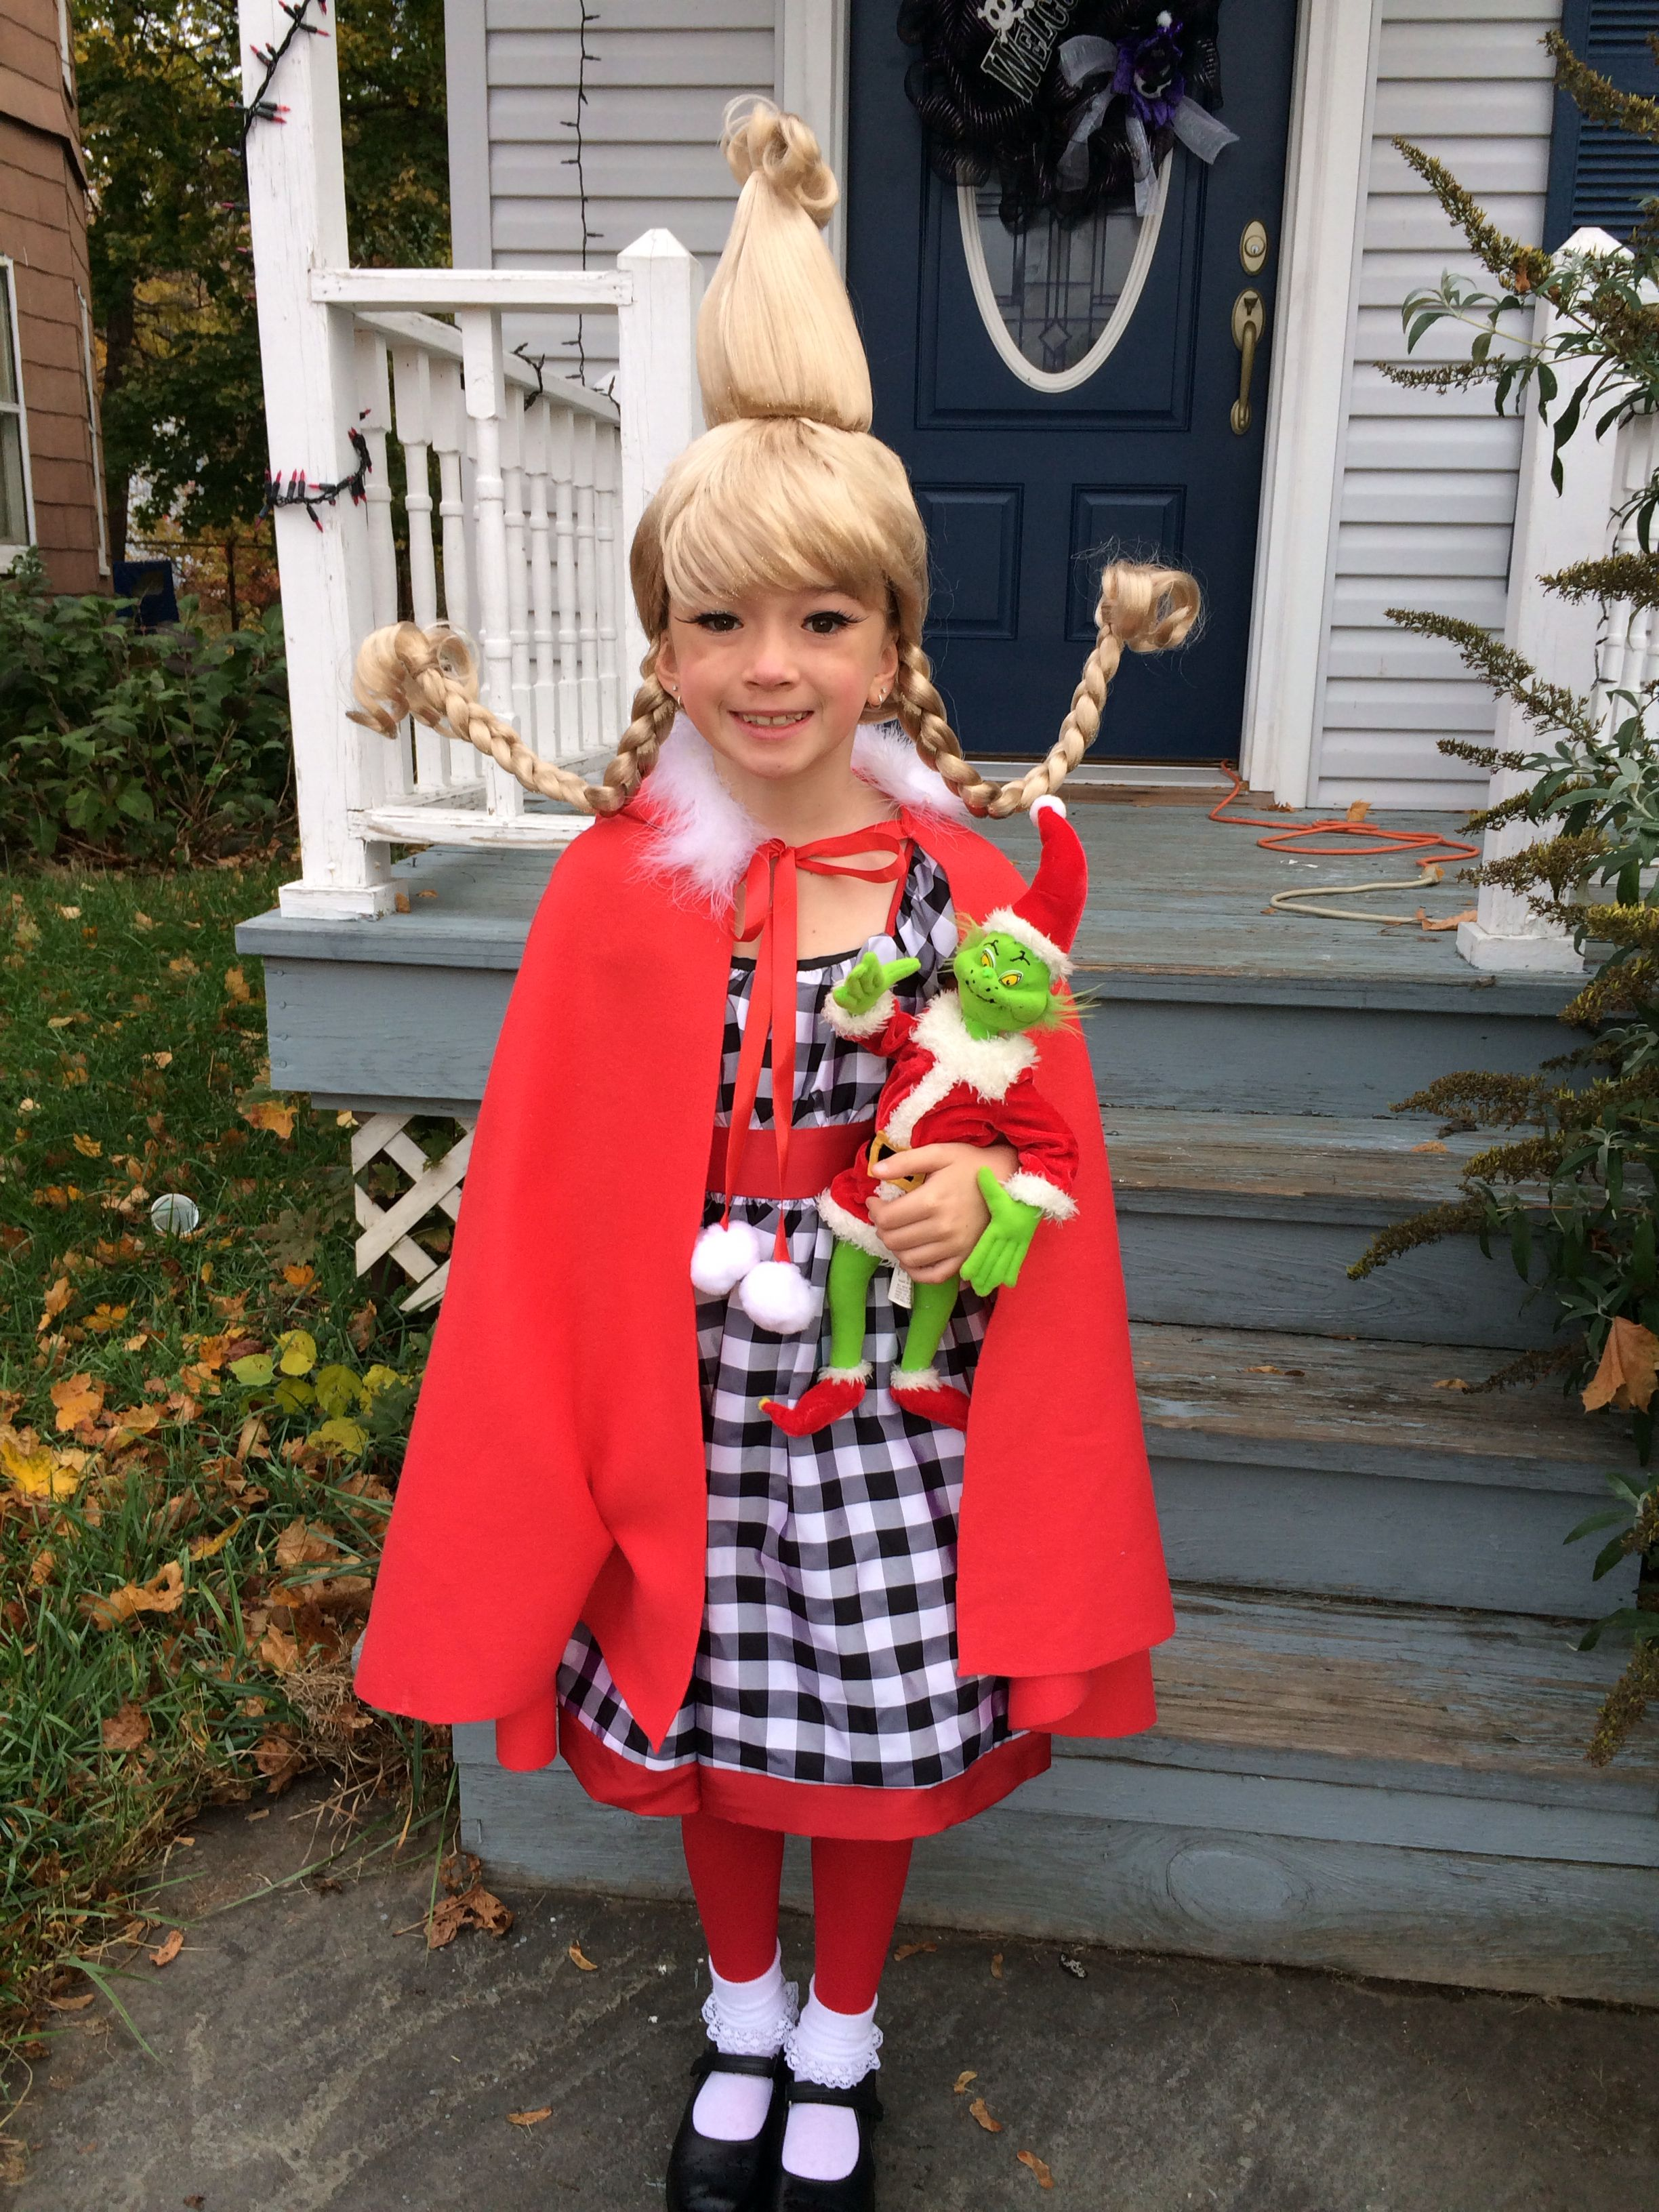 Cindy lou who costume … Cindy lou who costume, Christmas